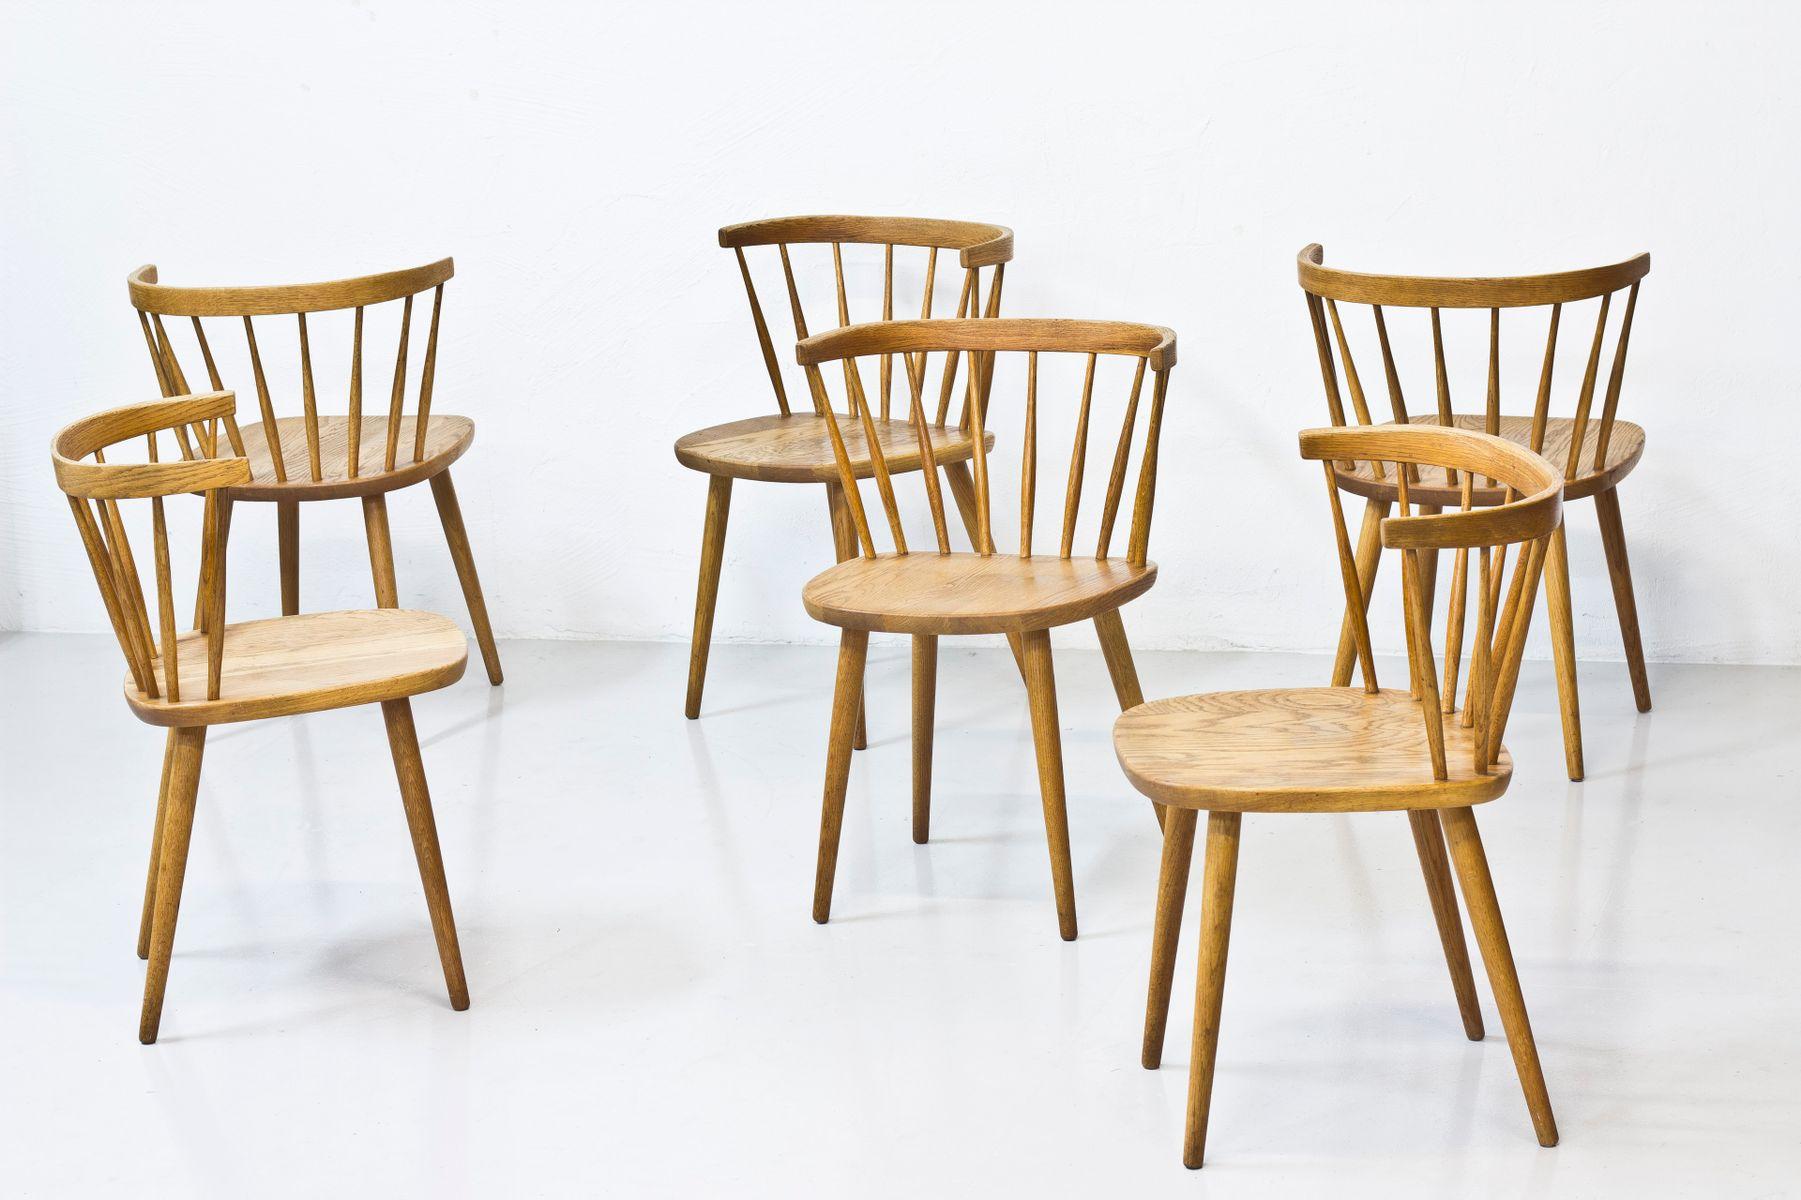 Bobino Stühle von Yngve Ekström für Stolab, 1950er, 6er Set bei Pamono ka